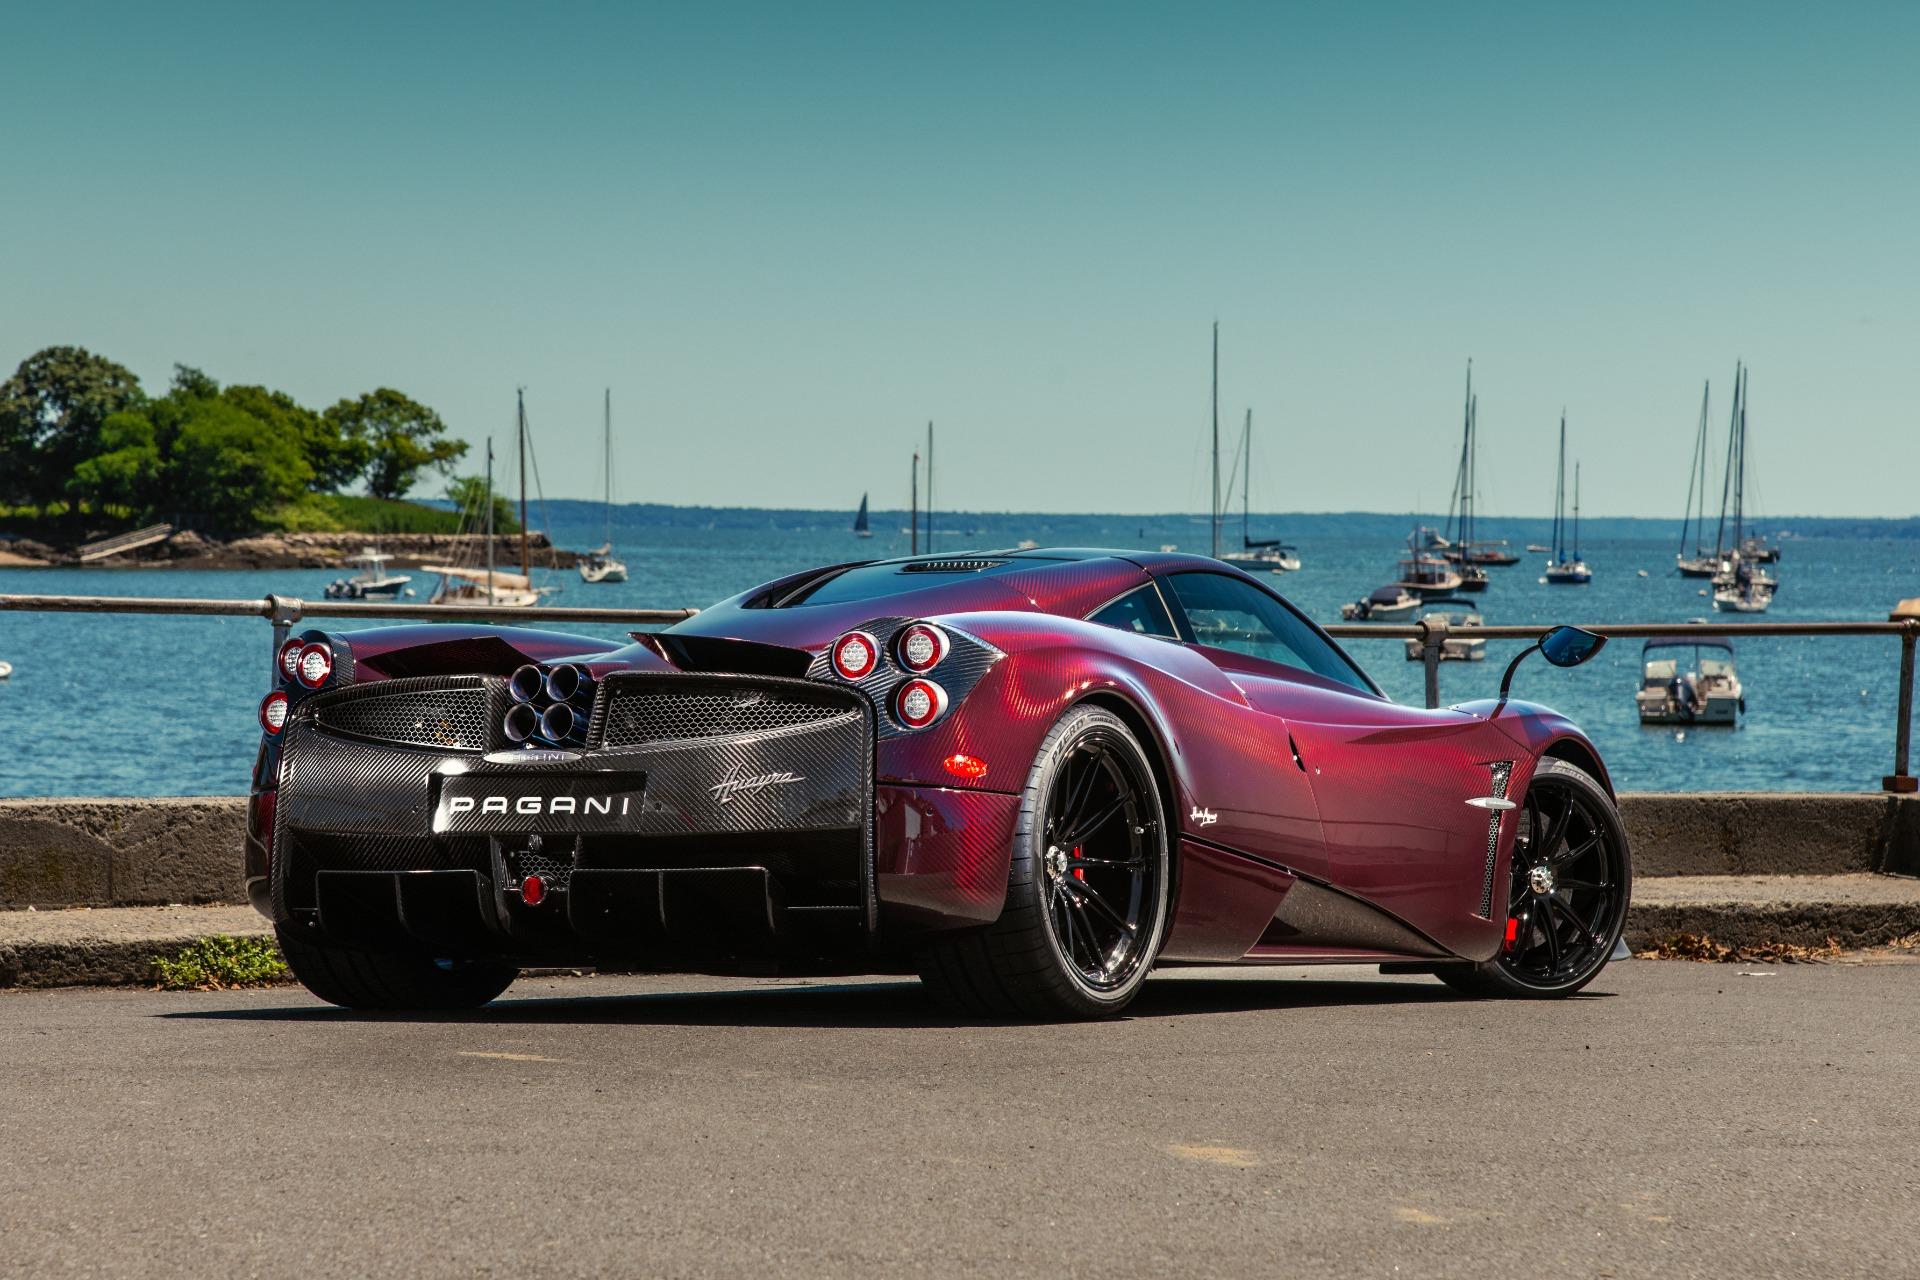 Used 2014 Pagani Huayra Tempesta For Sale In Greenwich, CT. Alfa Romeo of Greenwich, 7321 2841_p2